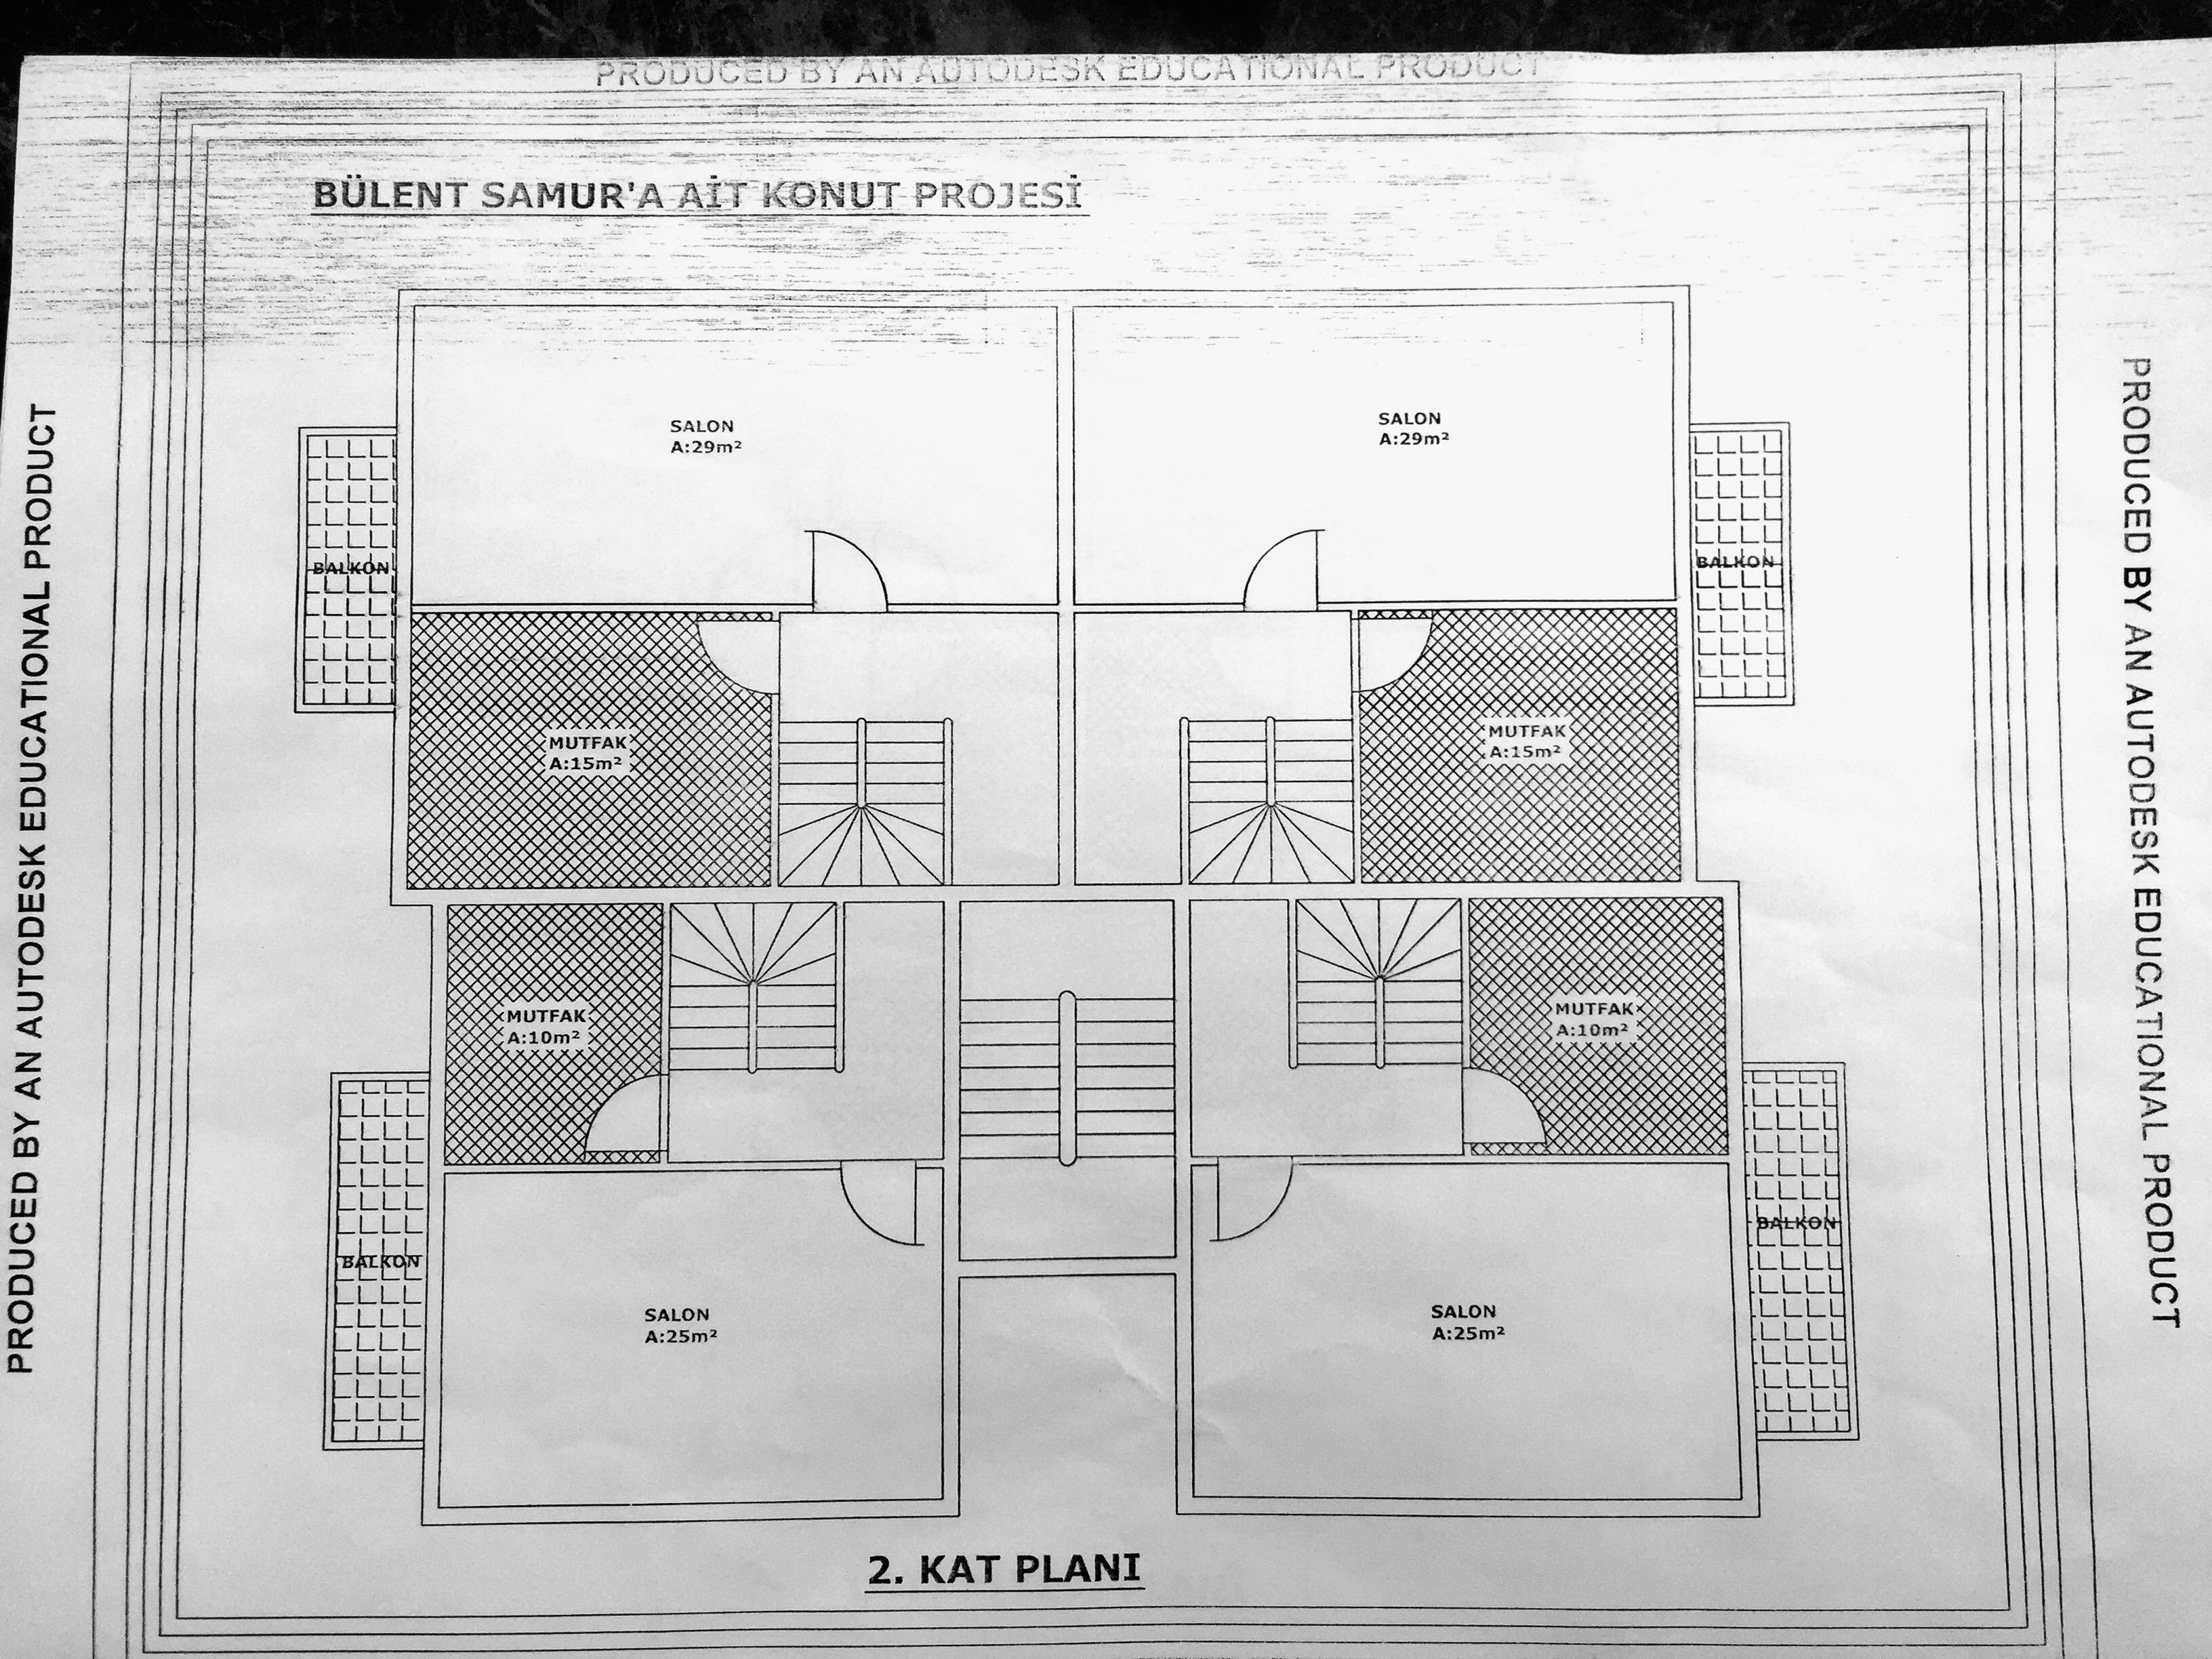 2. Kat Planı